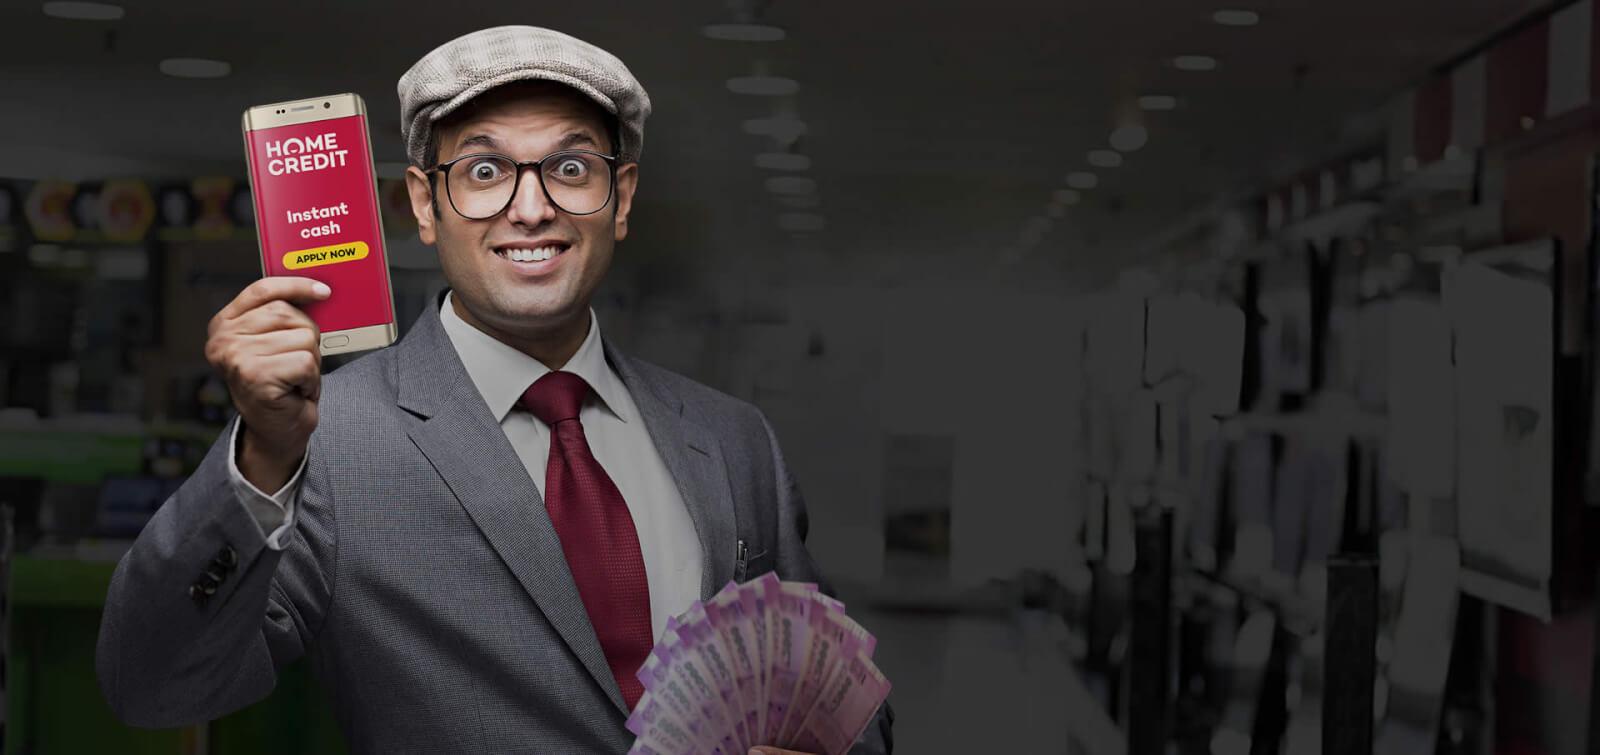 Характеристика кредитных карт банка Хоум Кредит